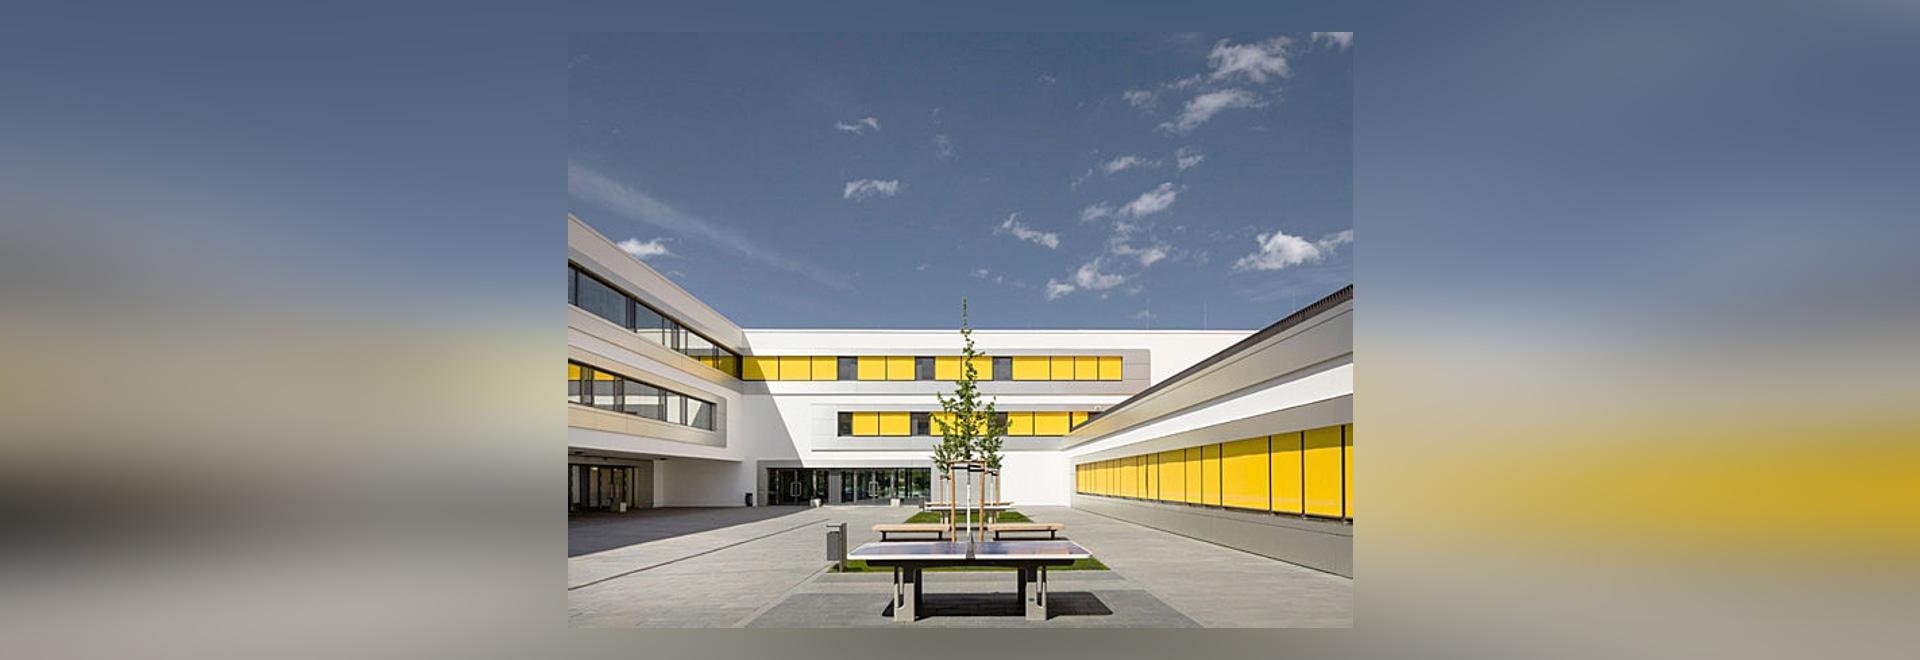 3. Schule Leipzig - Modern School : Aluminium facade contributing to passive house standard